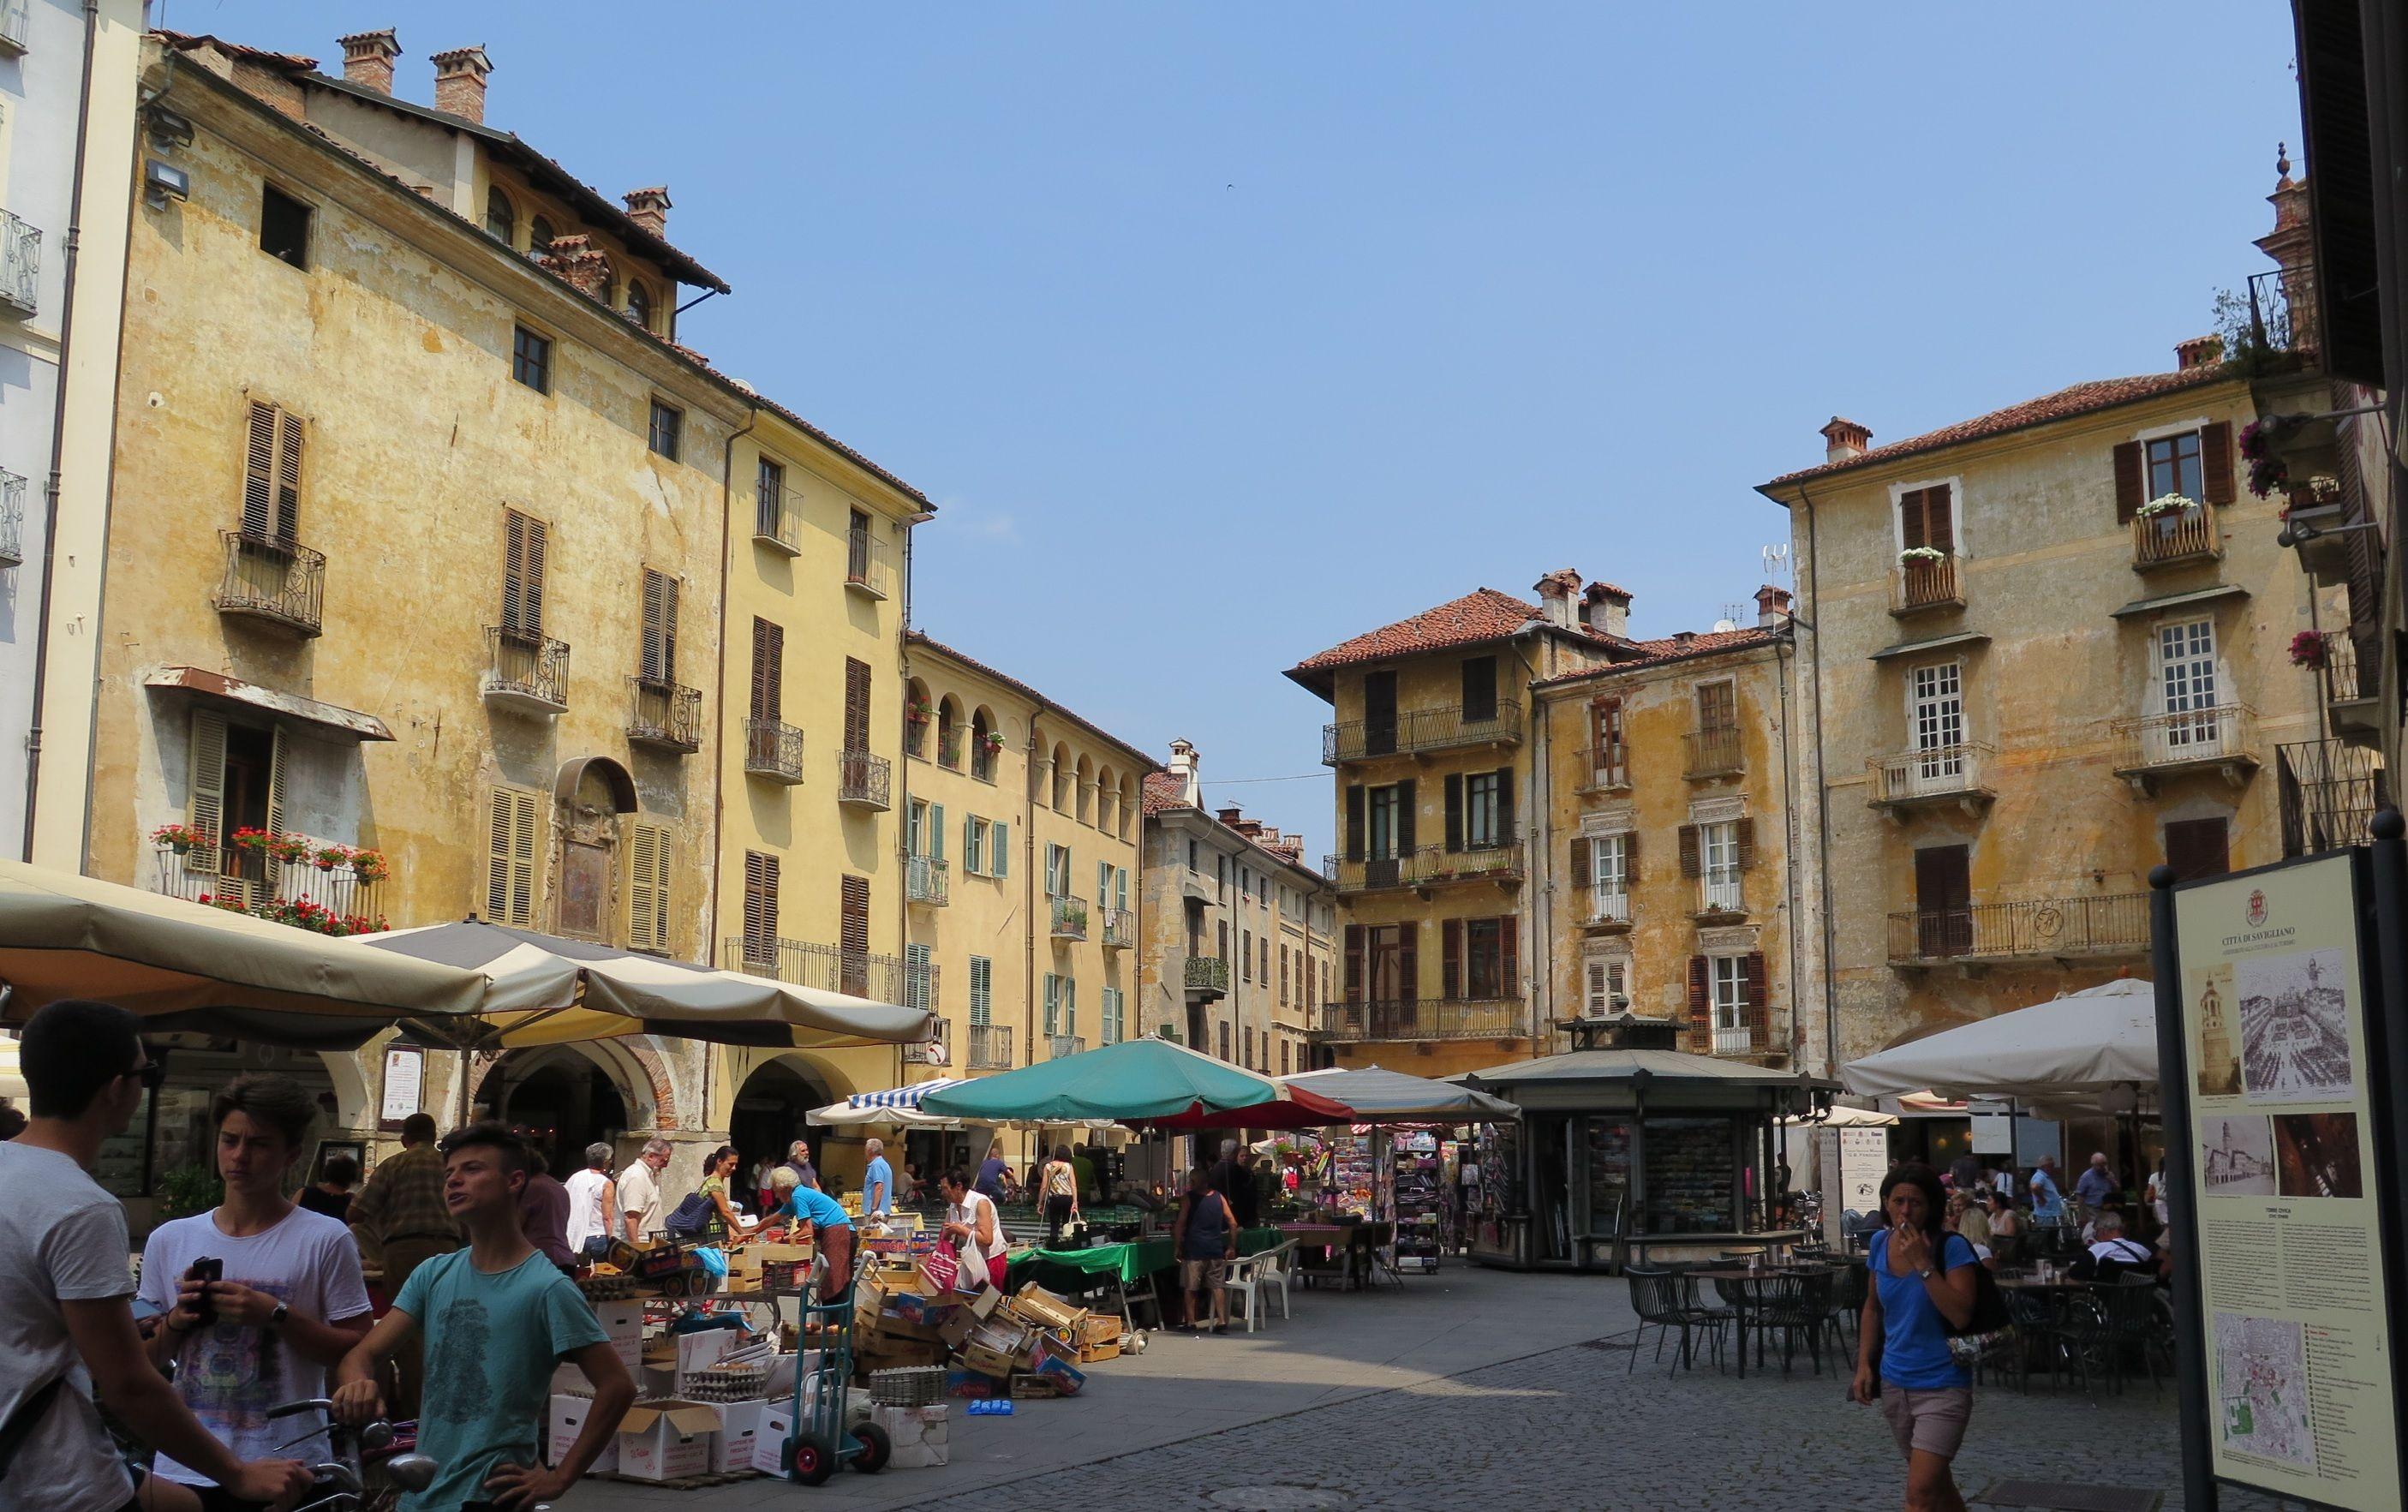 Savigliano, Juli 2015